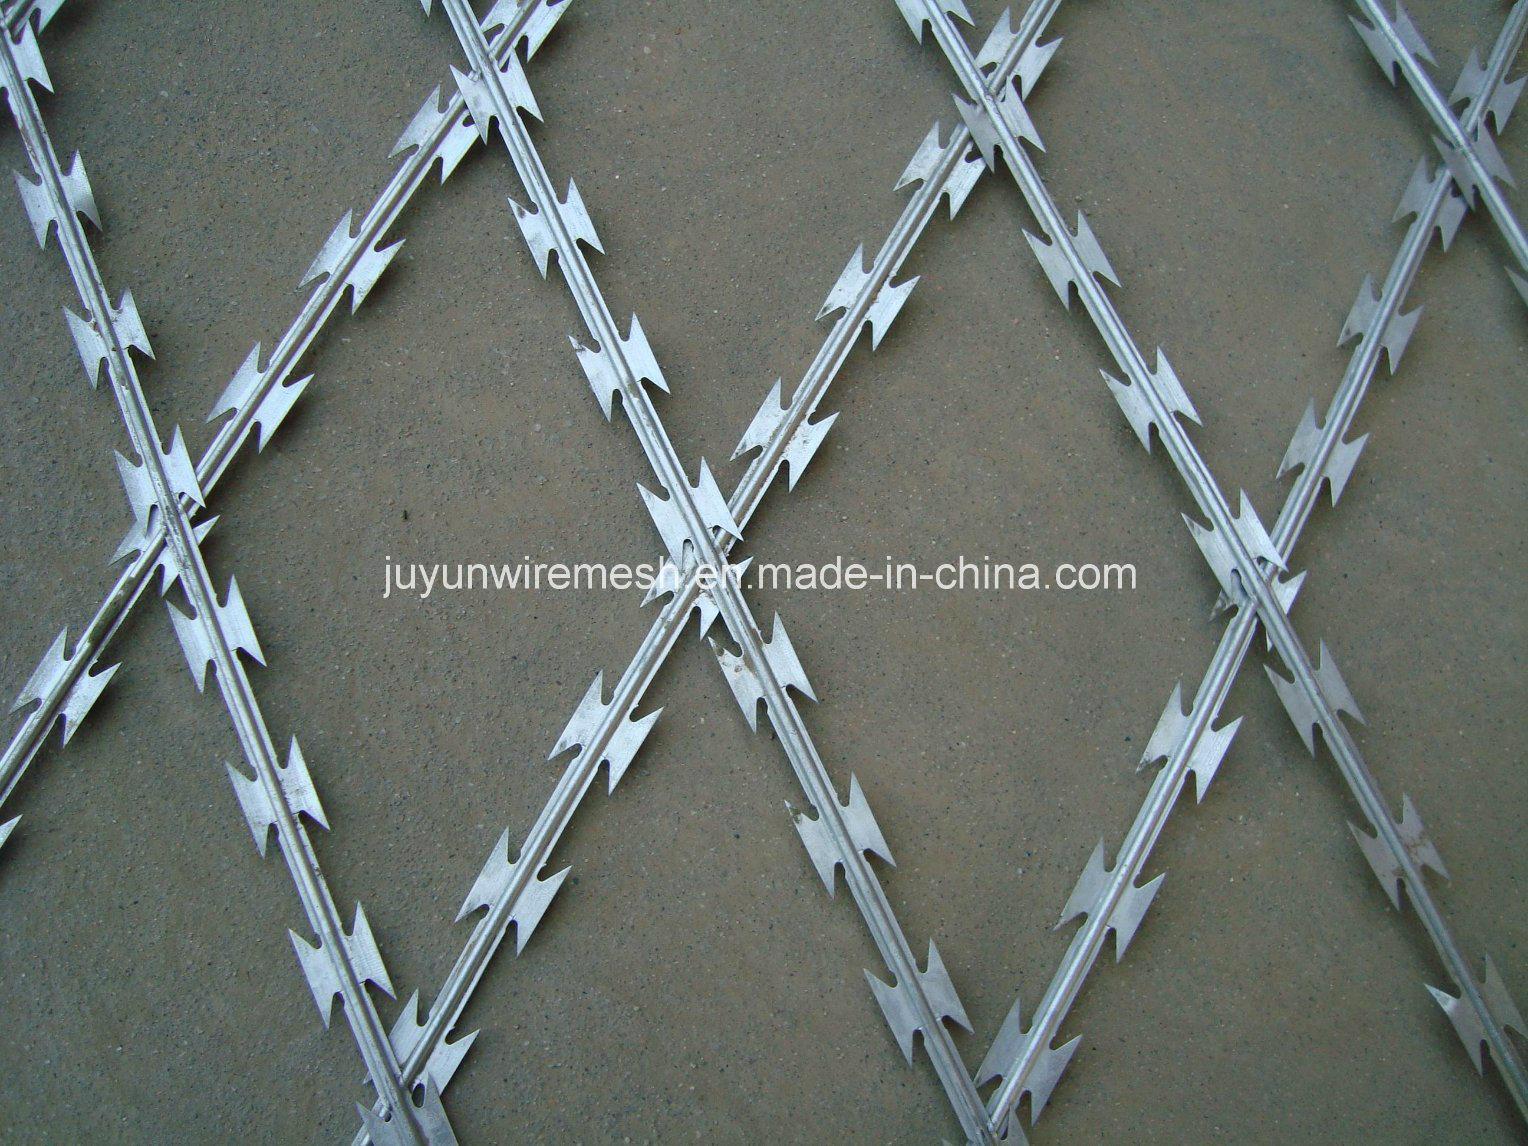 China Concertina Razor Wire/Galvanized Concertina Razor Wire/Hight ...